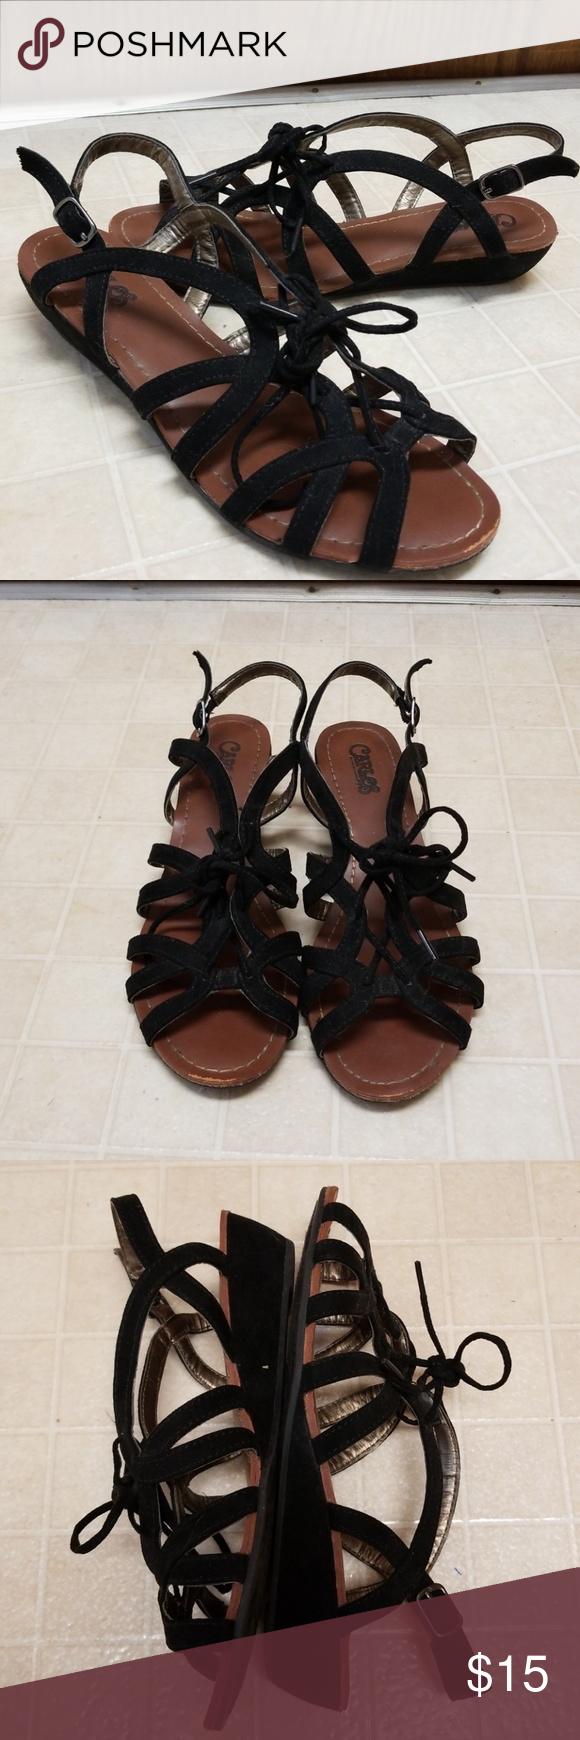 Carlos by Carlos Santana gladiator sandals